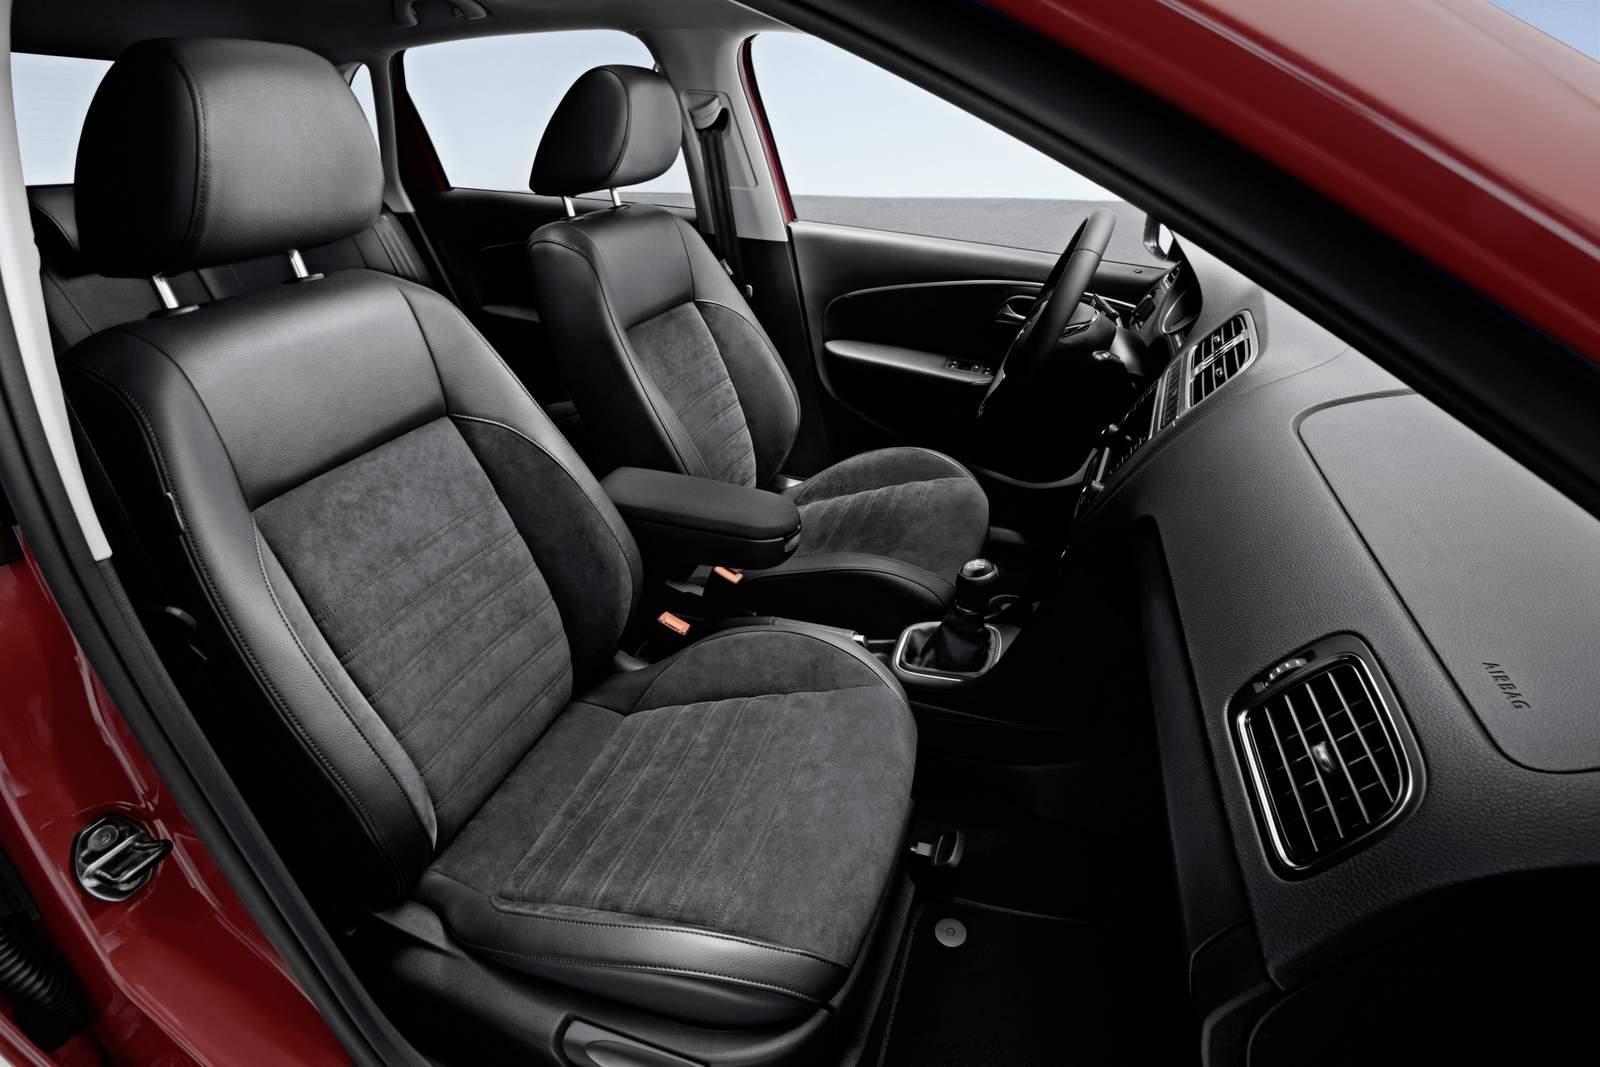 Novo Volkswagen Polo 2015 - interior